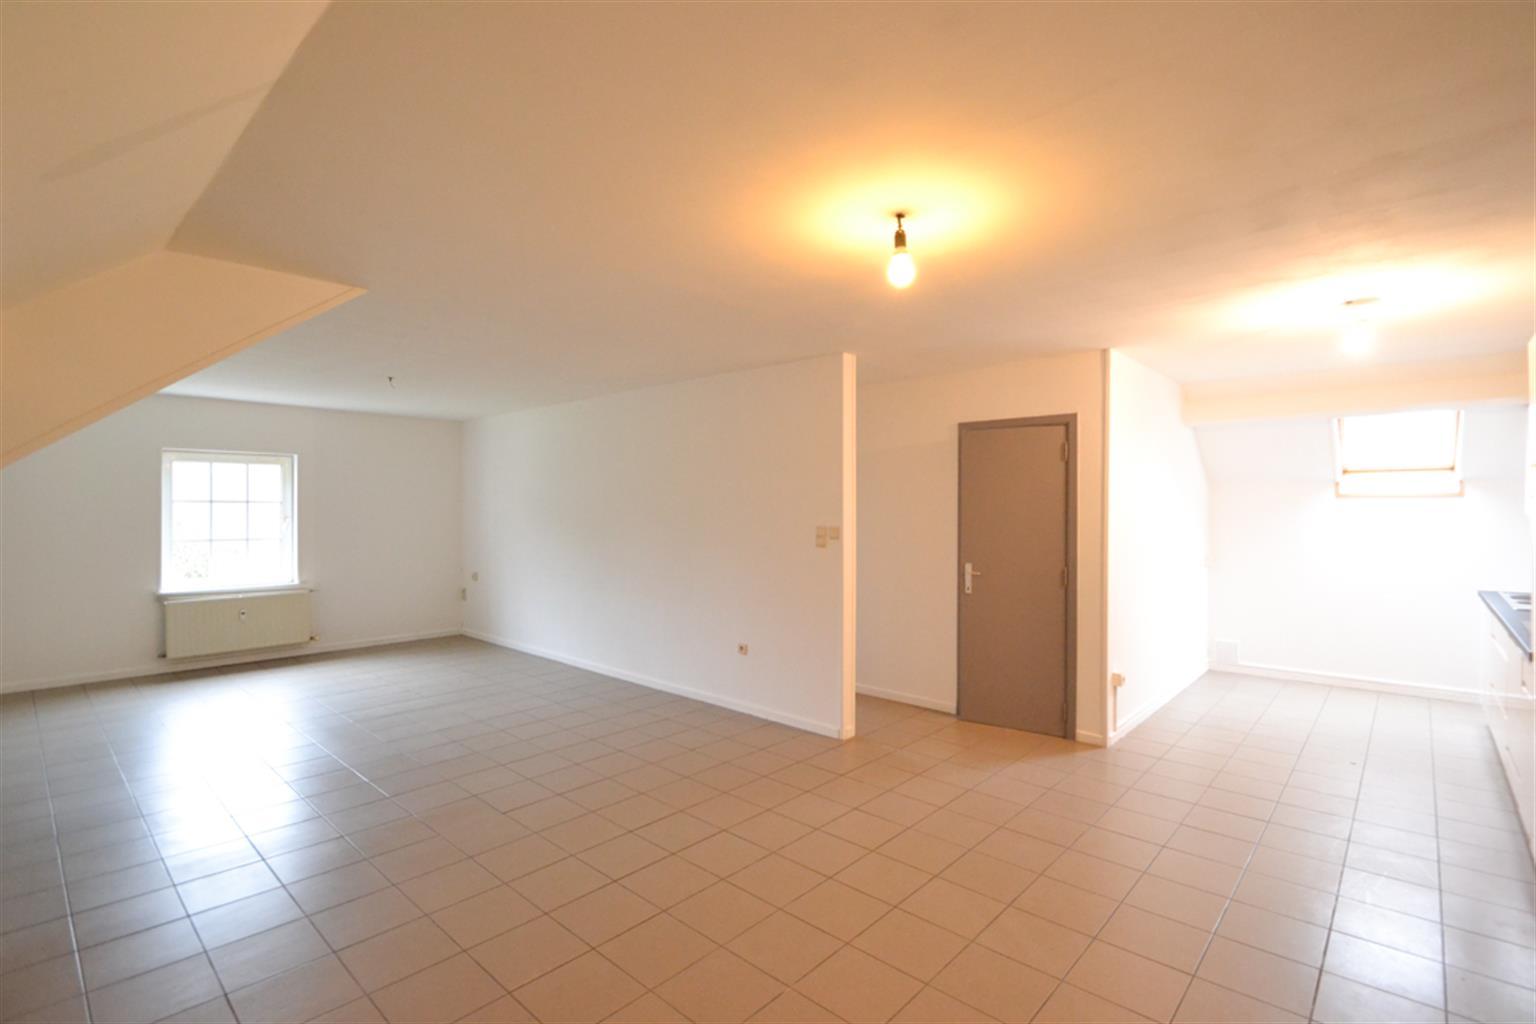 Appartement - Leval-Trahegnies - #3703788-0